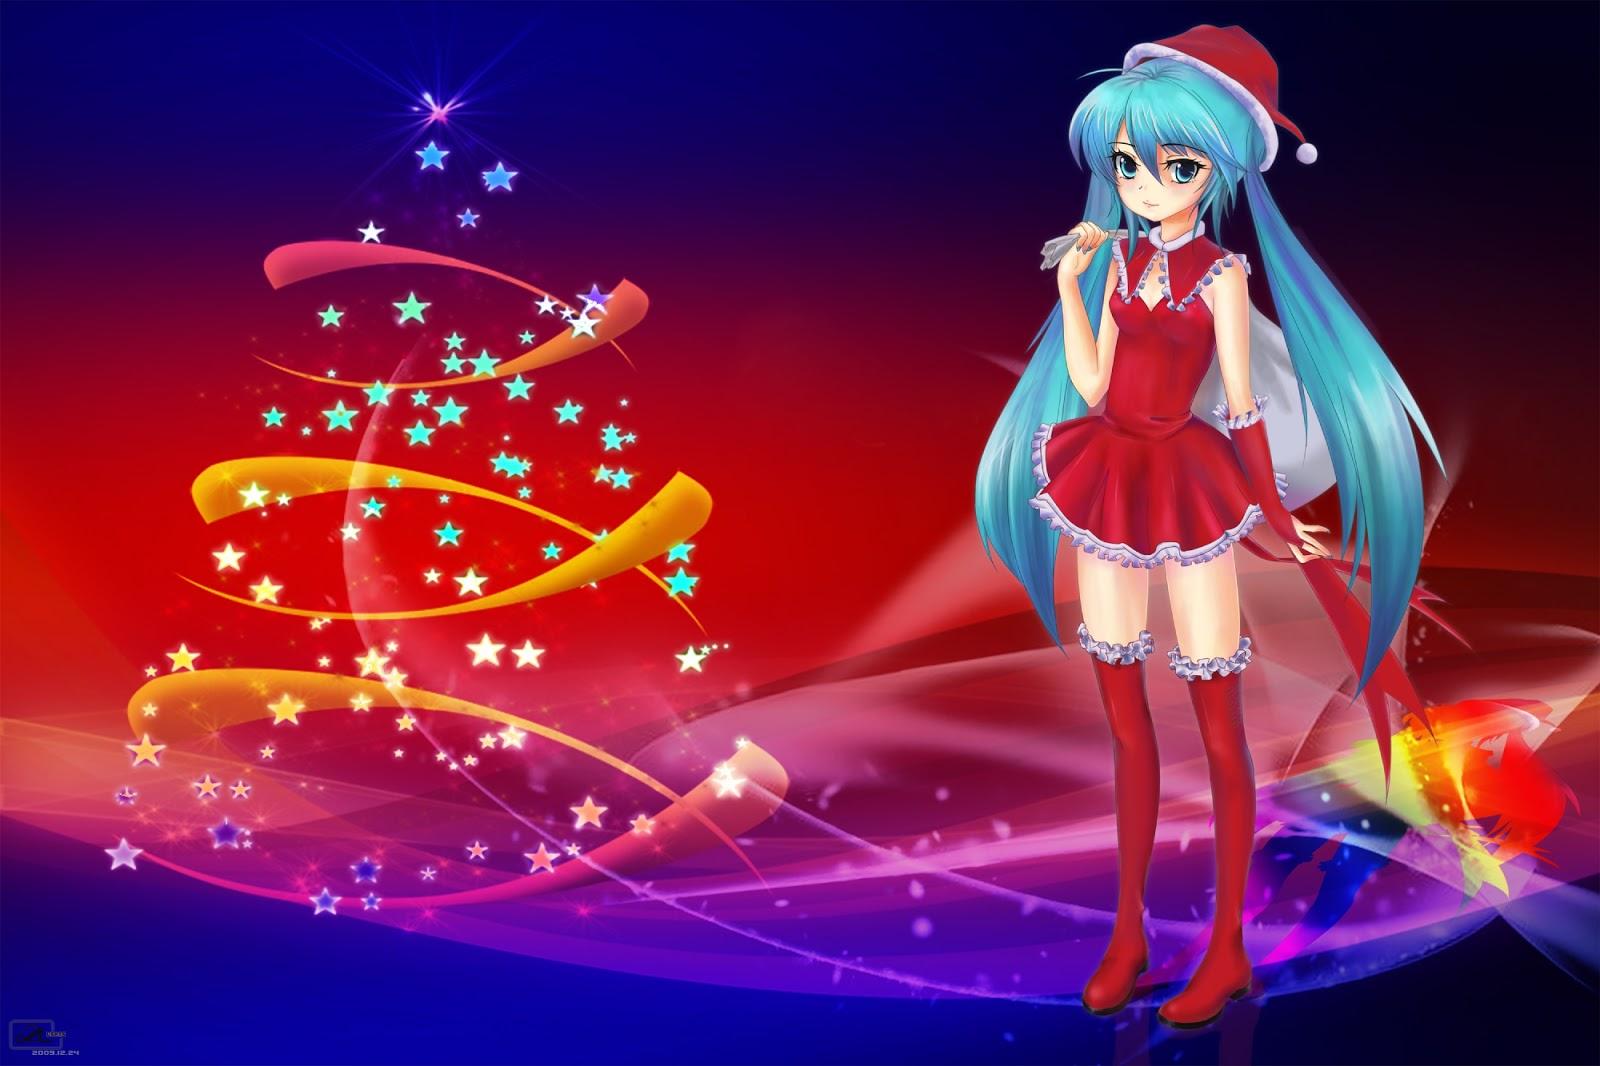 Fondo de pantallas | Fiesta de navidad anime v3